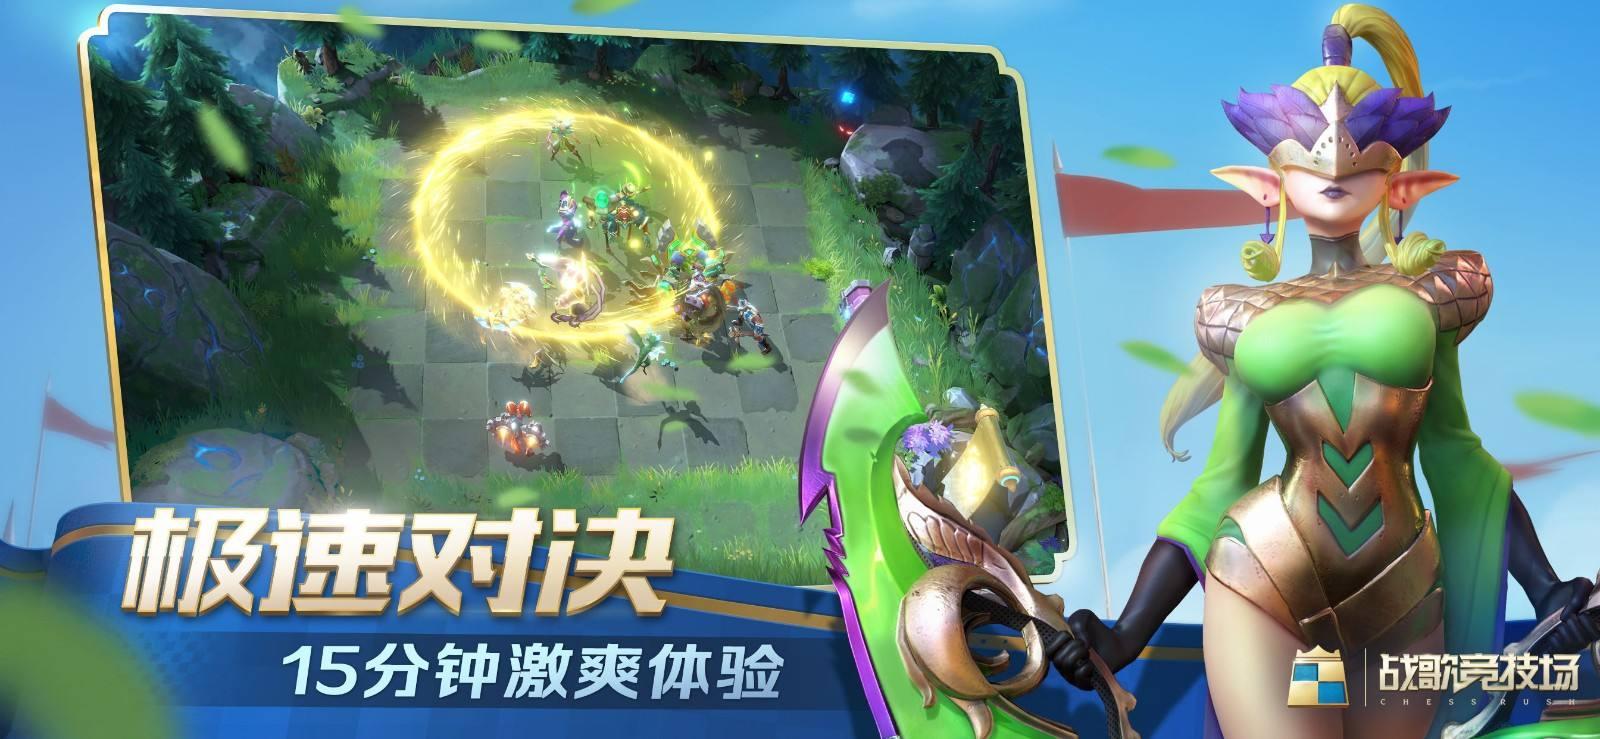 http://www.k2summit.cn/tiyujingsai/1161934.html